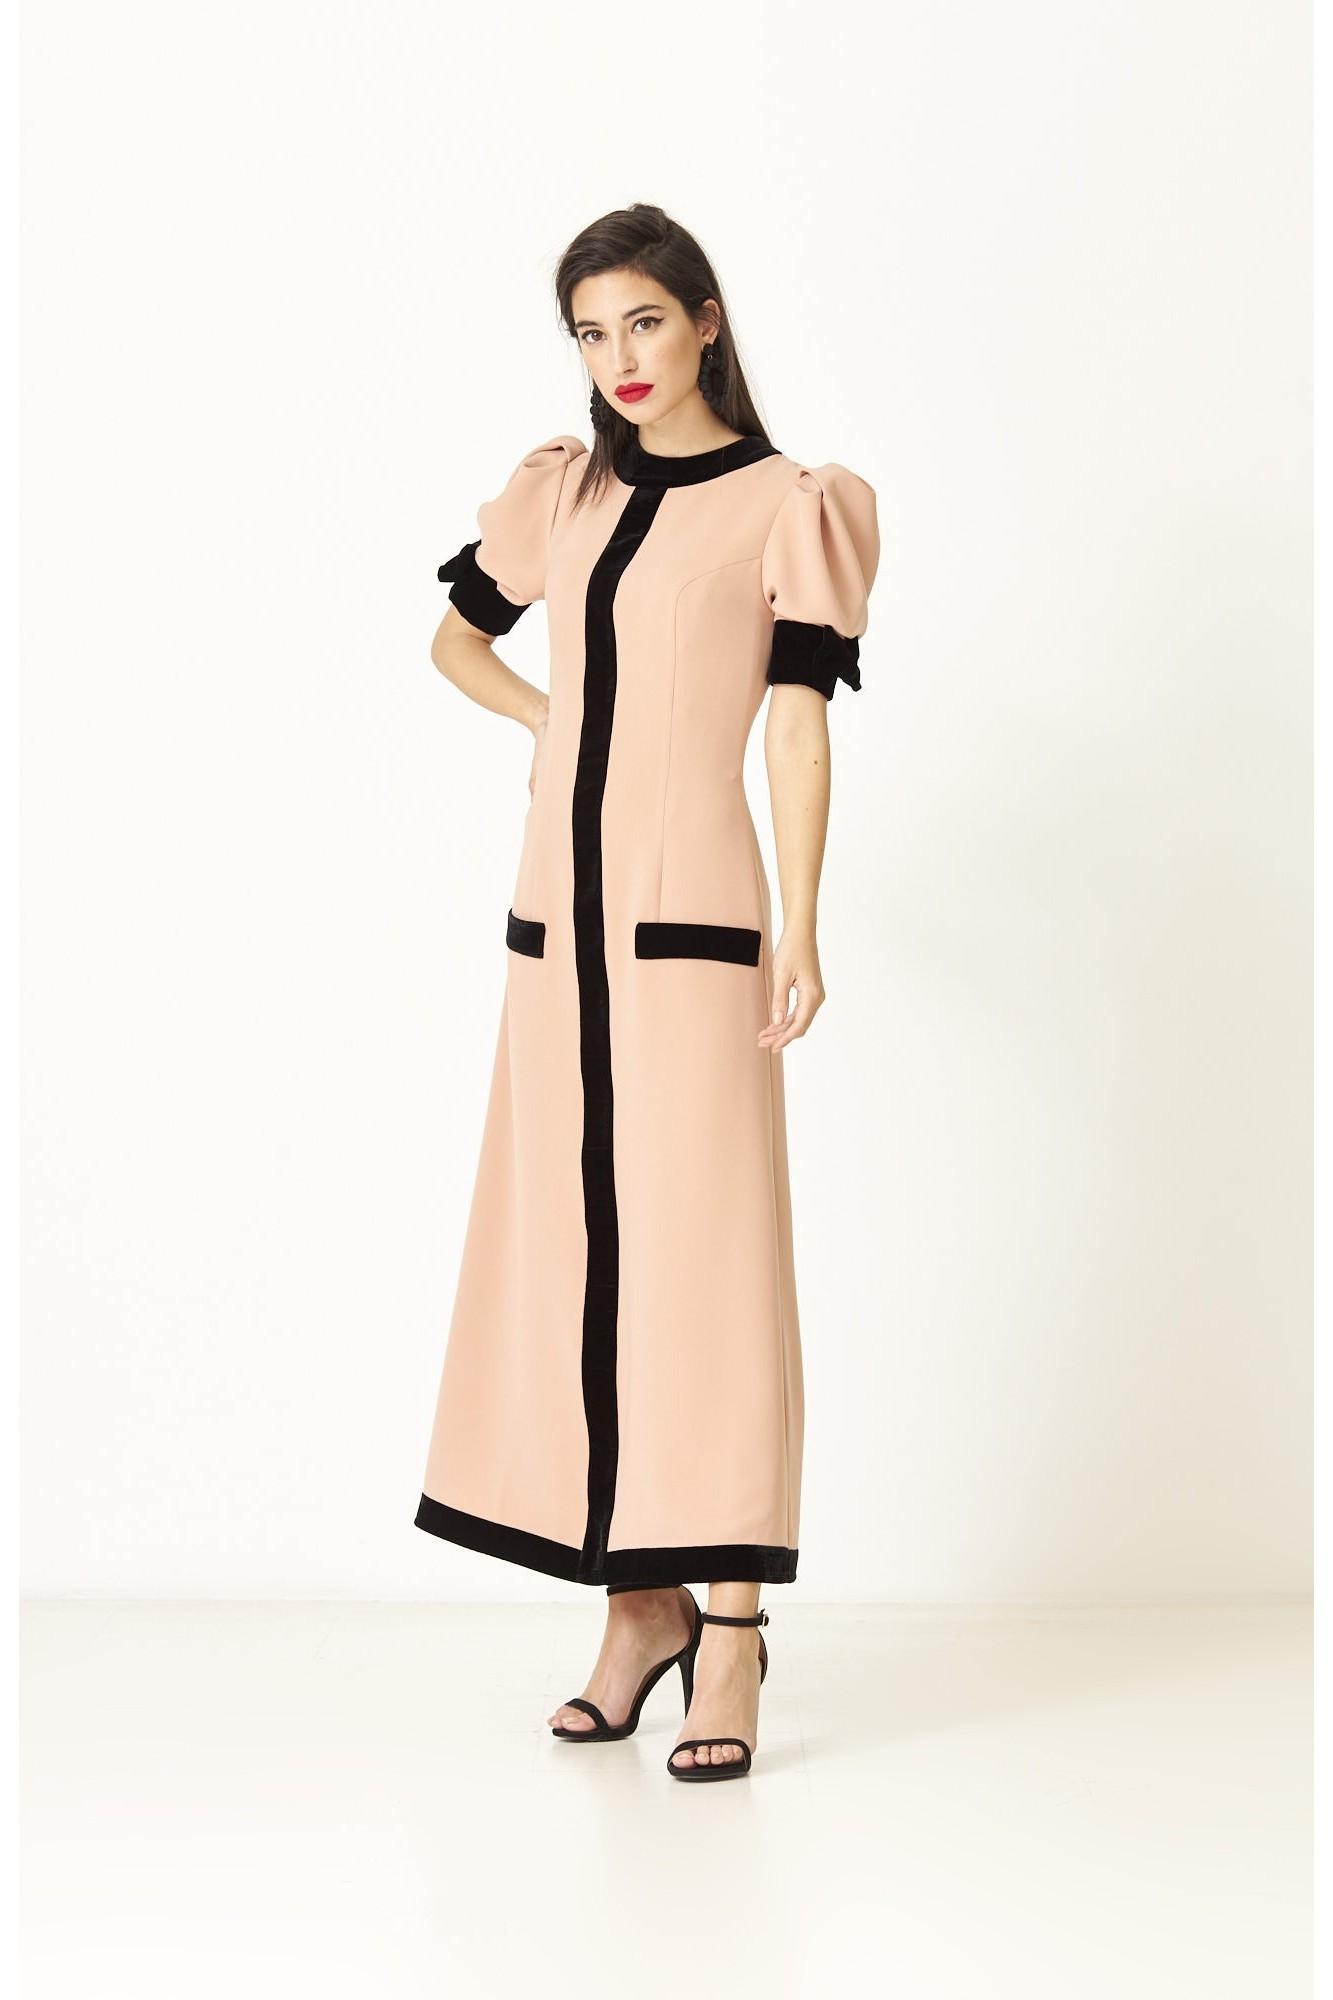 INES PINK DRESS